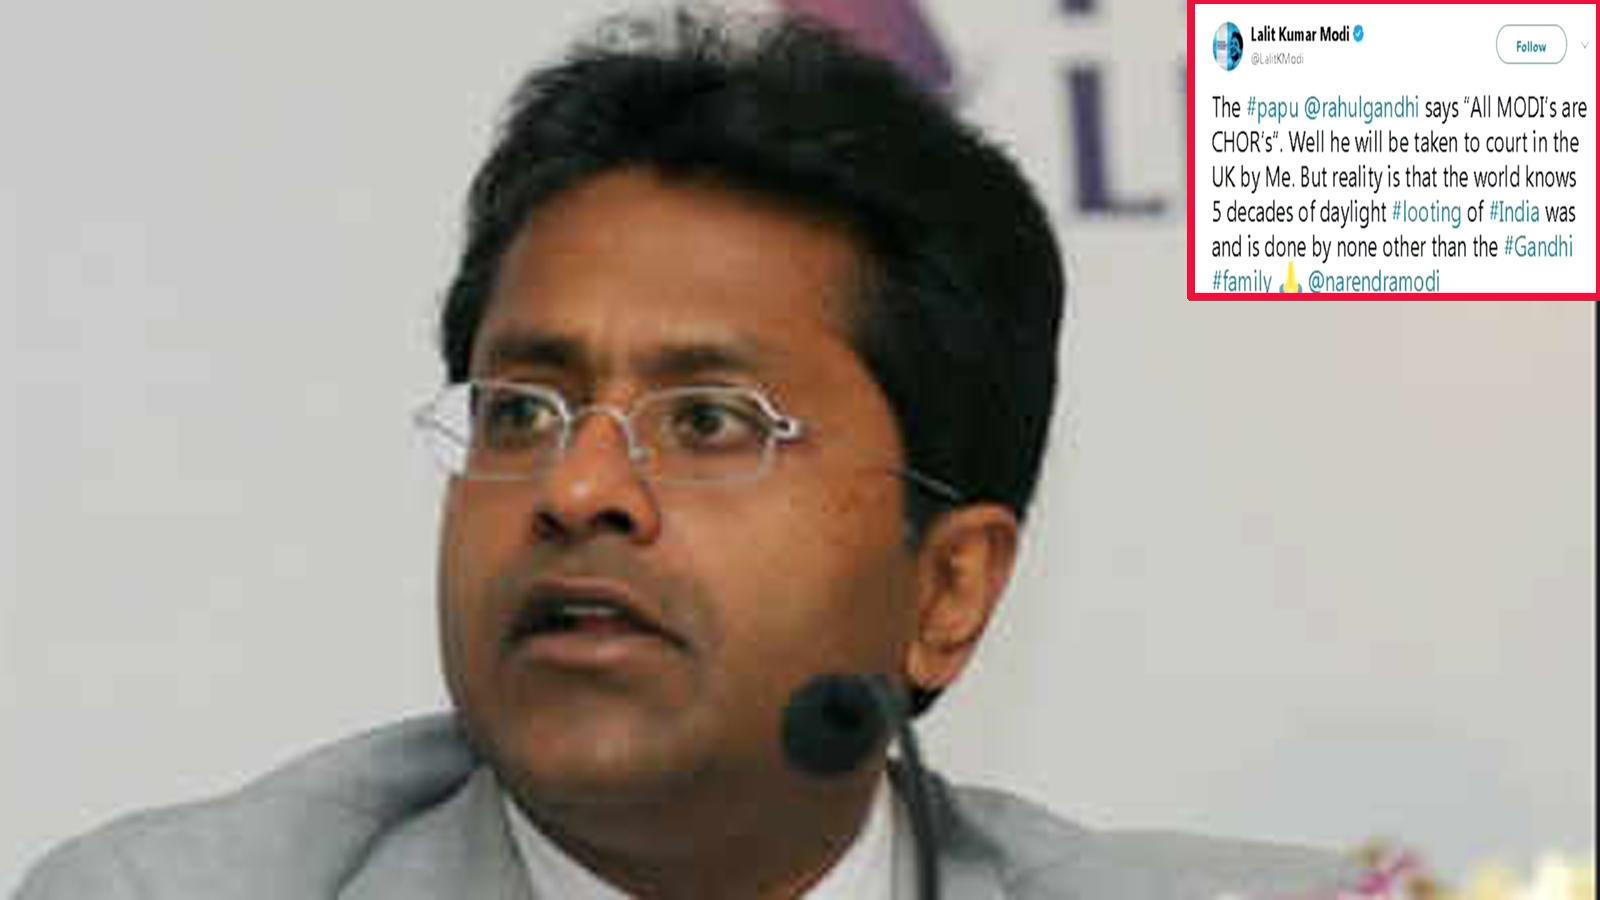 fugitive-businessman-lalit-modi-threatens-to-sue-rahul-gandhi